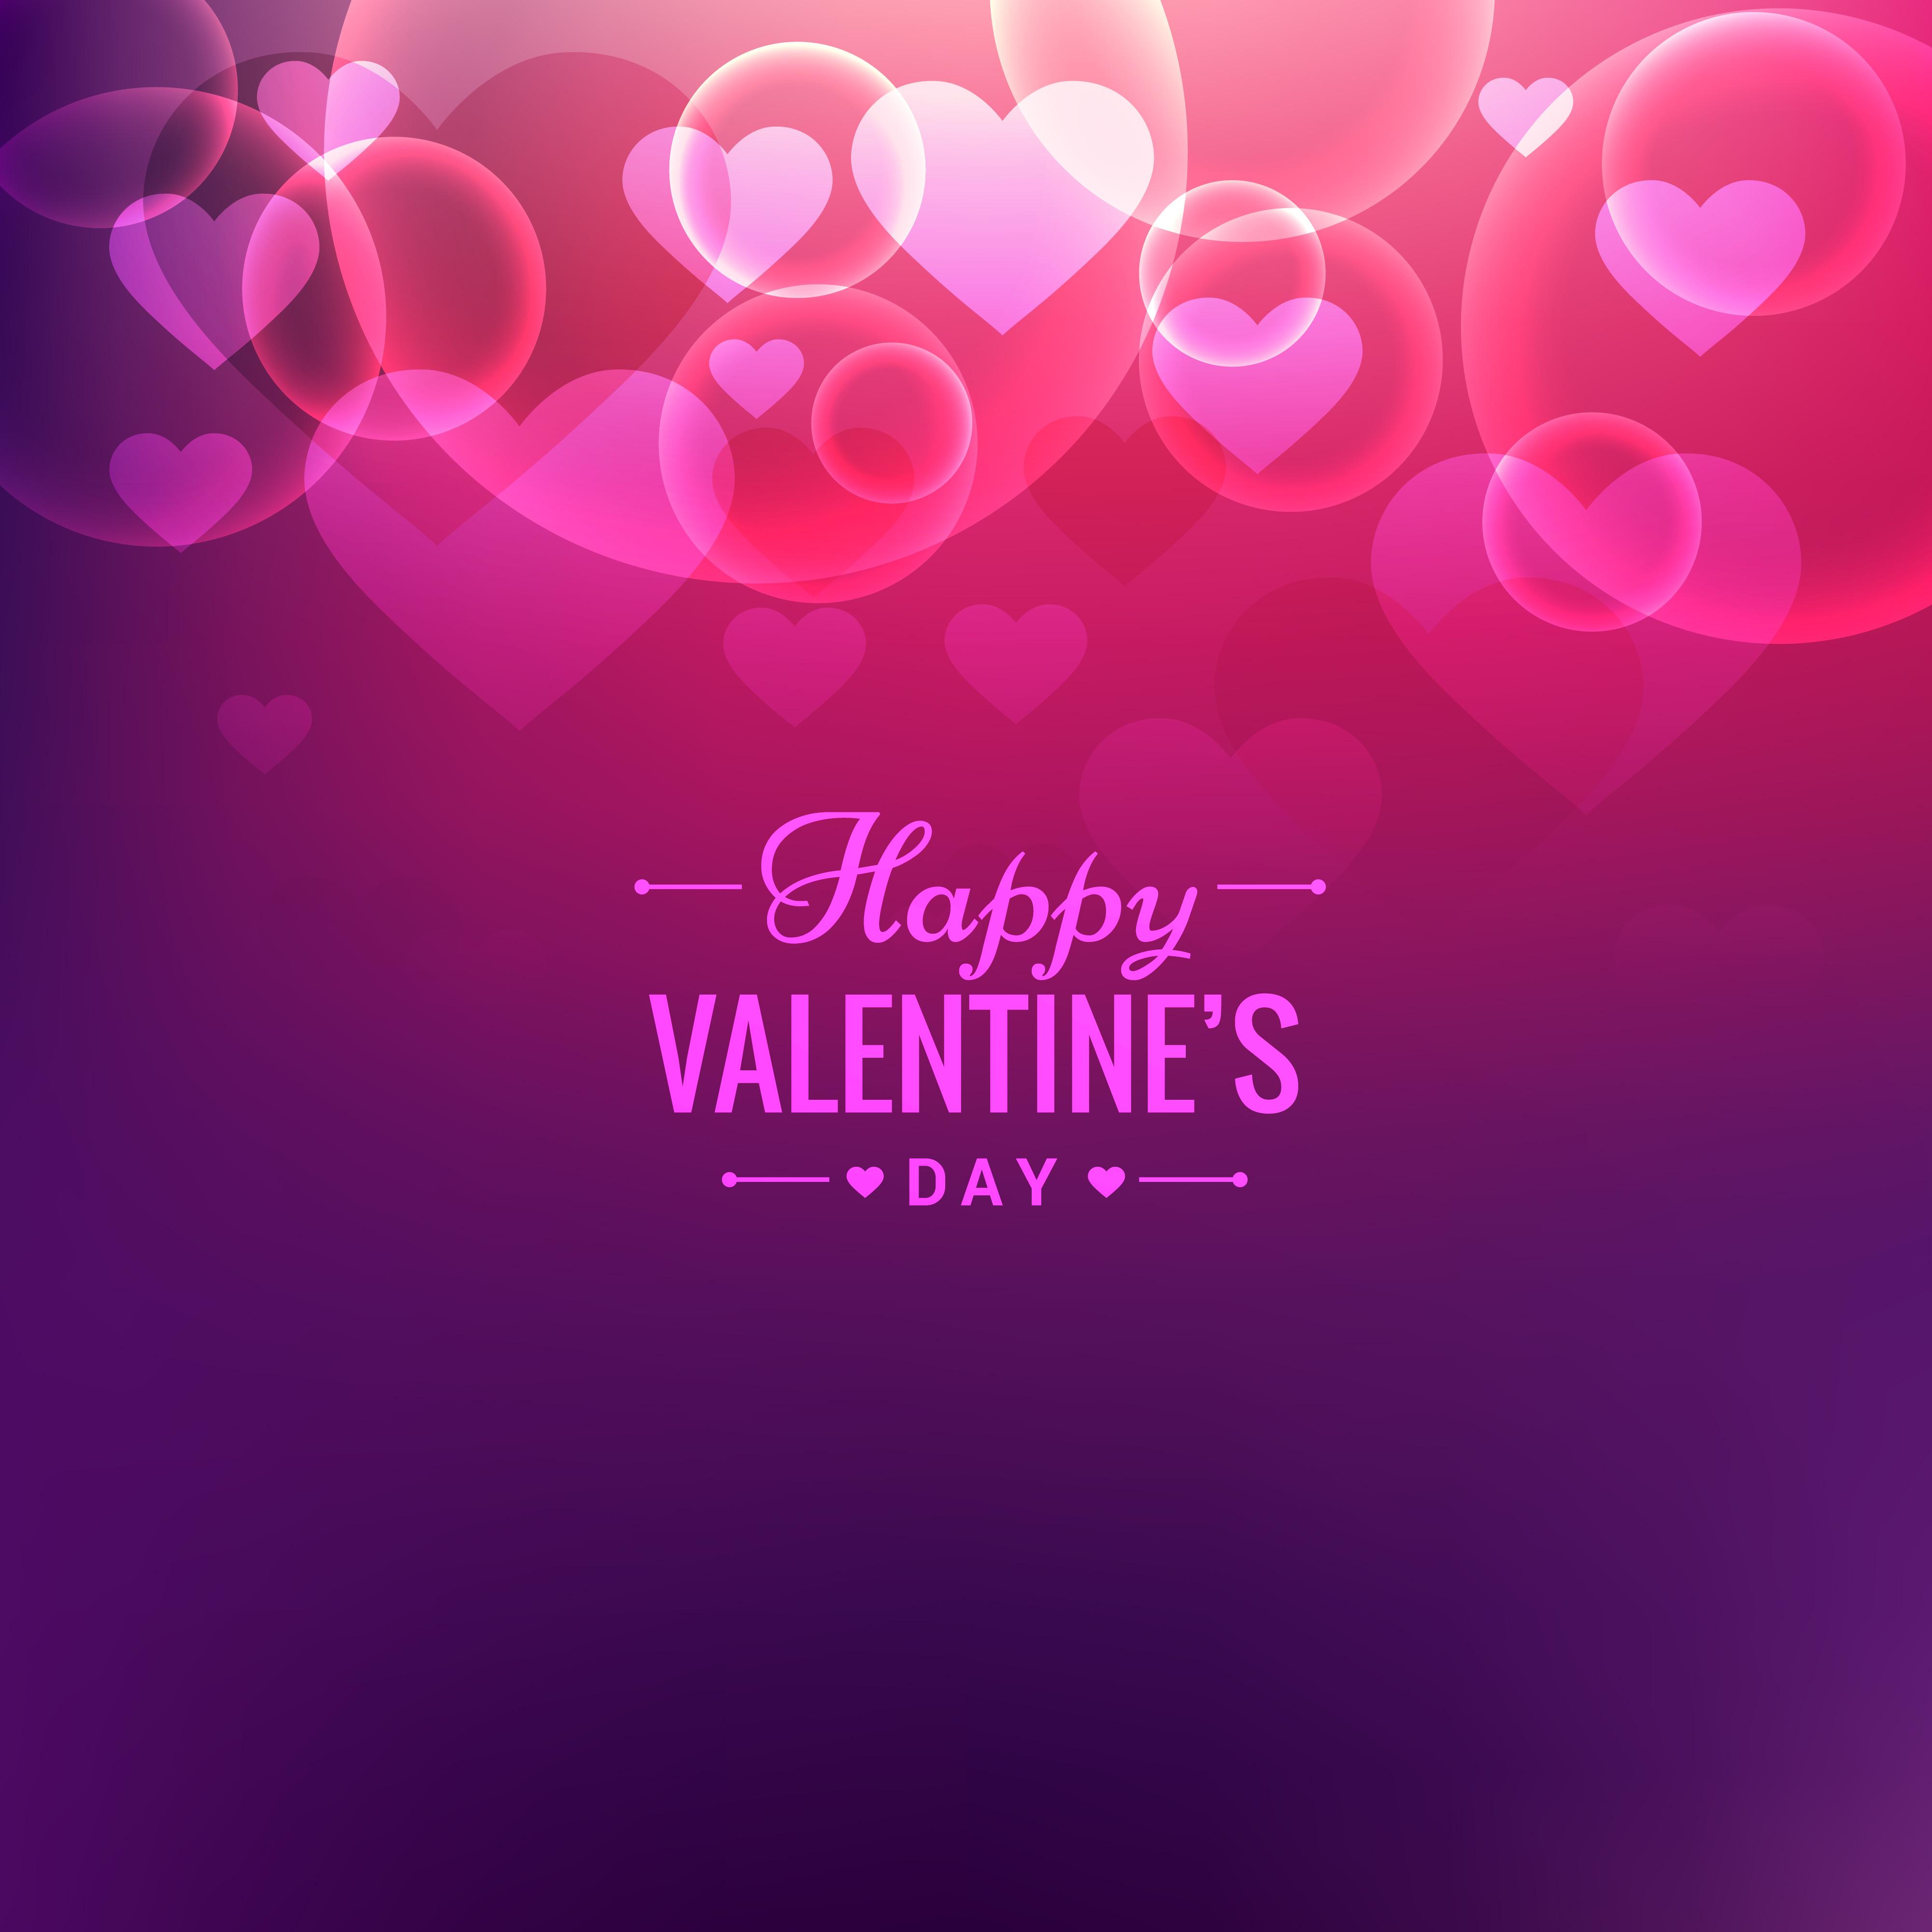 Valentines Day Wallpaper: Valentines Day Beautiful Background Vector Design